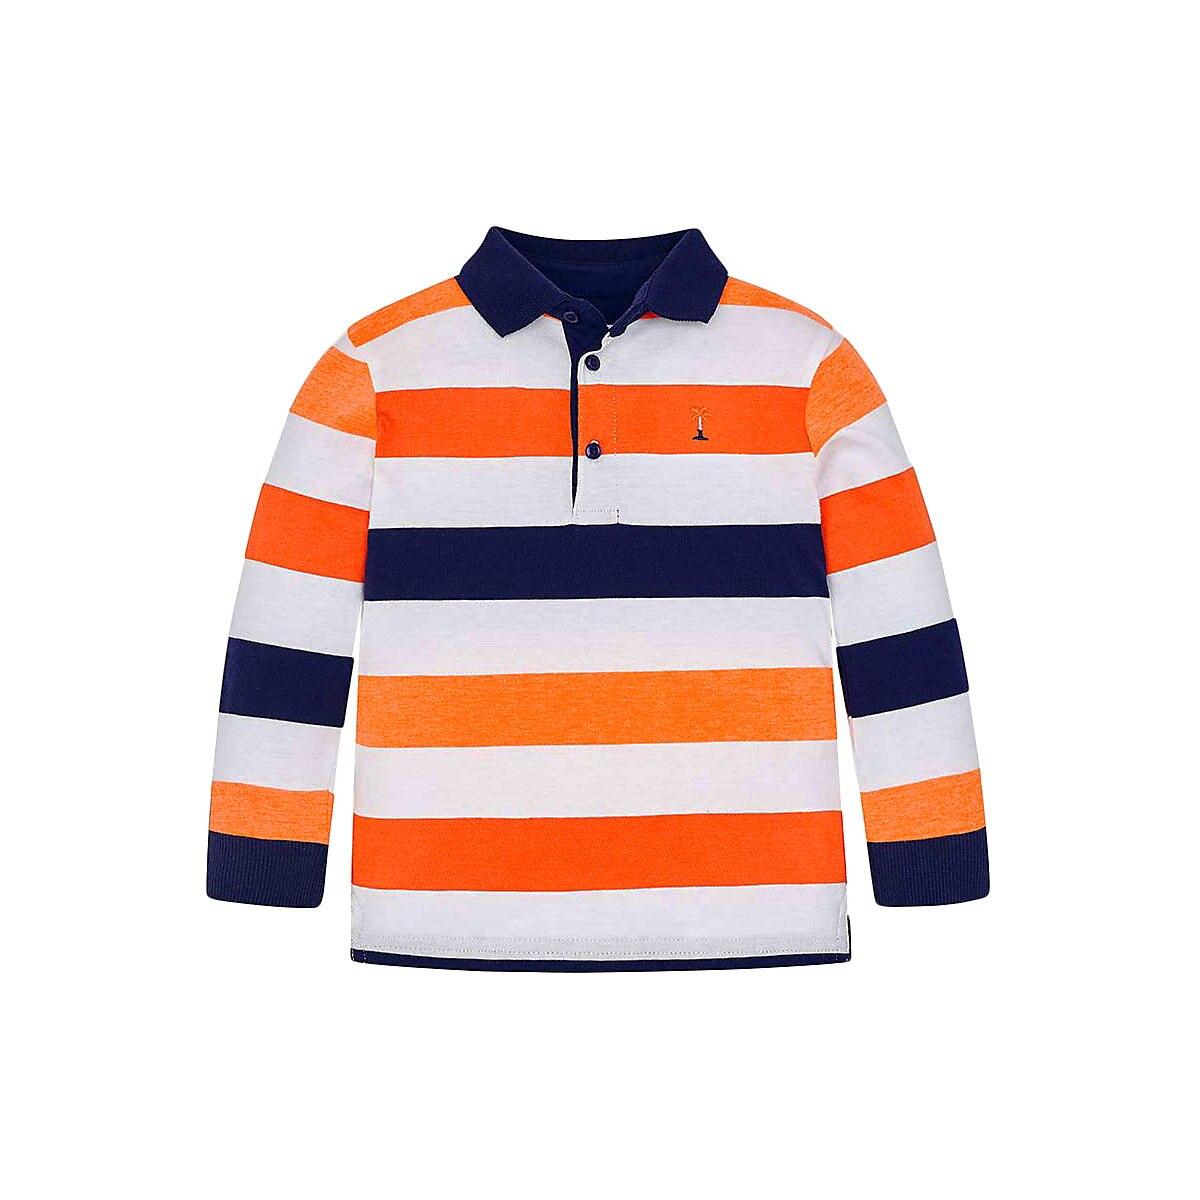 MAYORAL Polo Shirts 10685129 Children Clothing T-shirt Shirt The Print For Boys